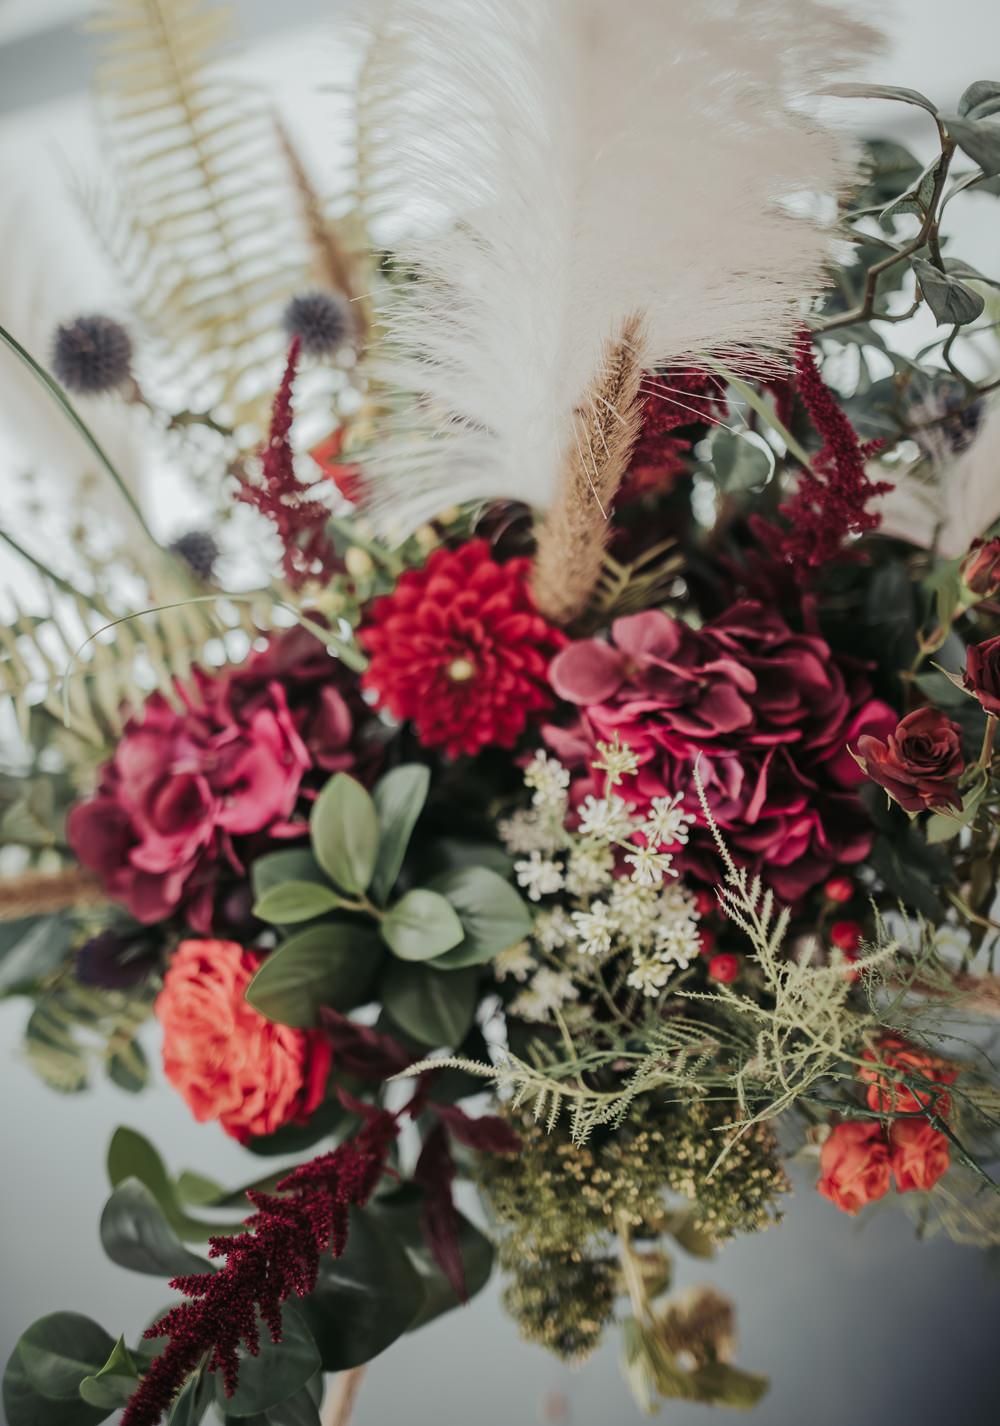 Bouquet Flowers Bride Bridal Hydrangea Burgundy Thistle Dahlia Feather Eco Friendly Wedding Inspiration Sarah Jayne Photography